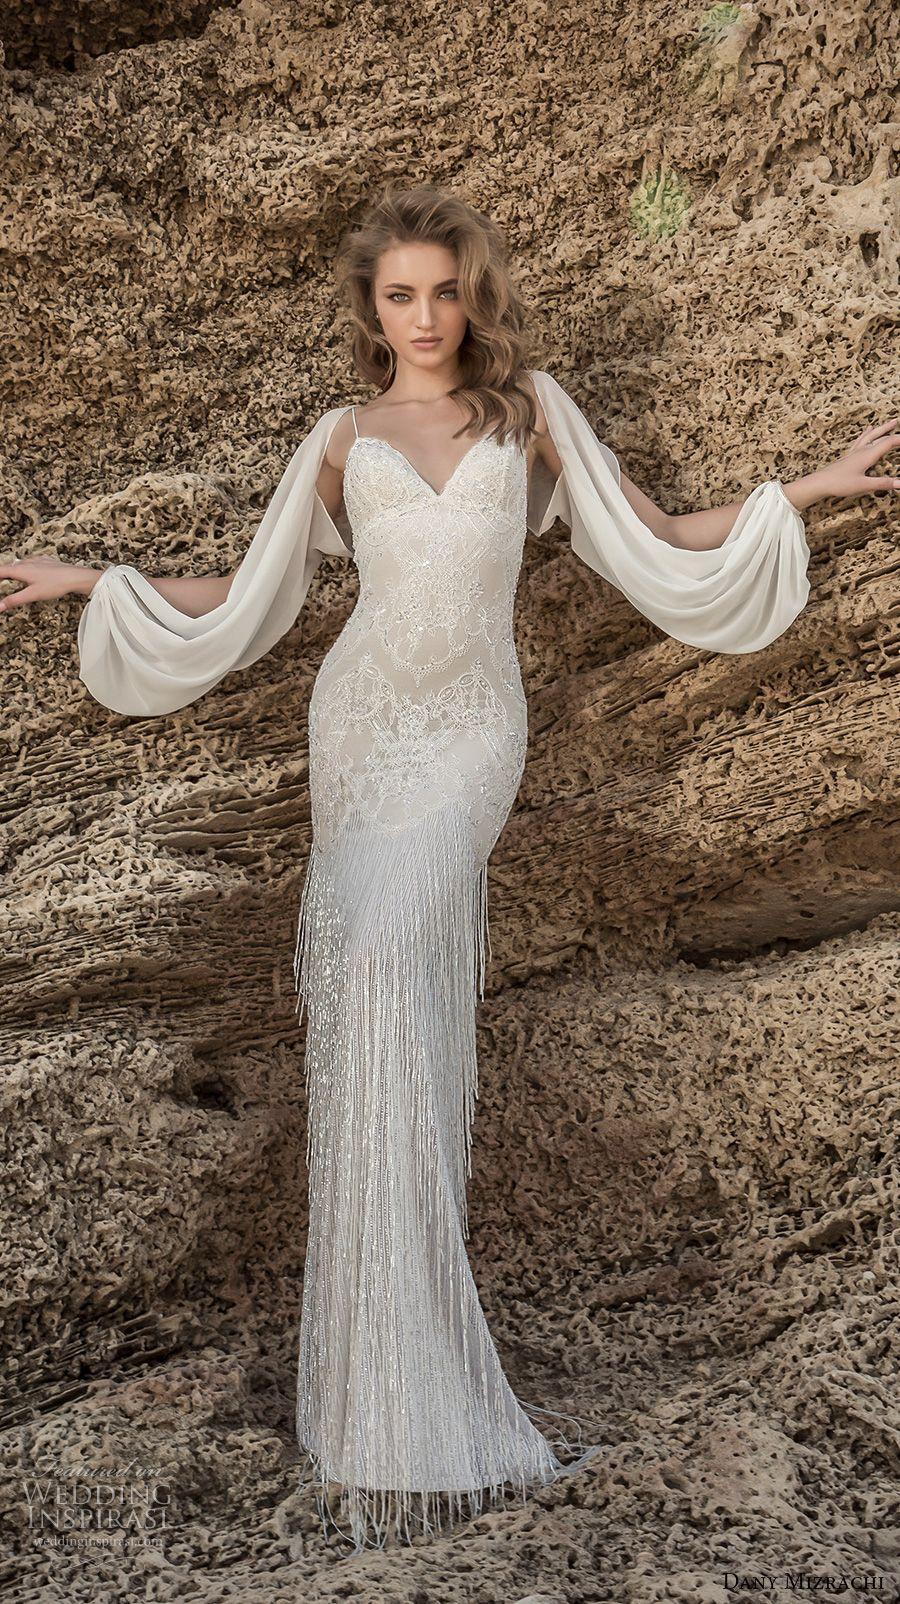 Dany mizrachi wedding dresses wedding ideas brides u brides